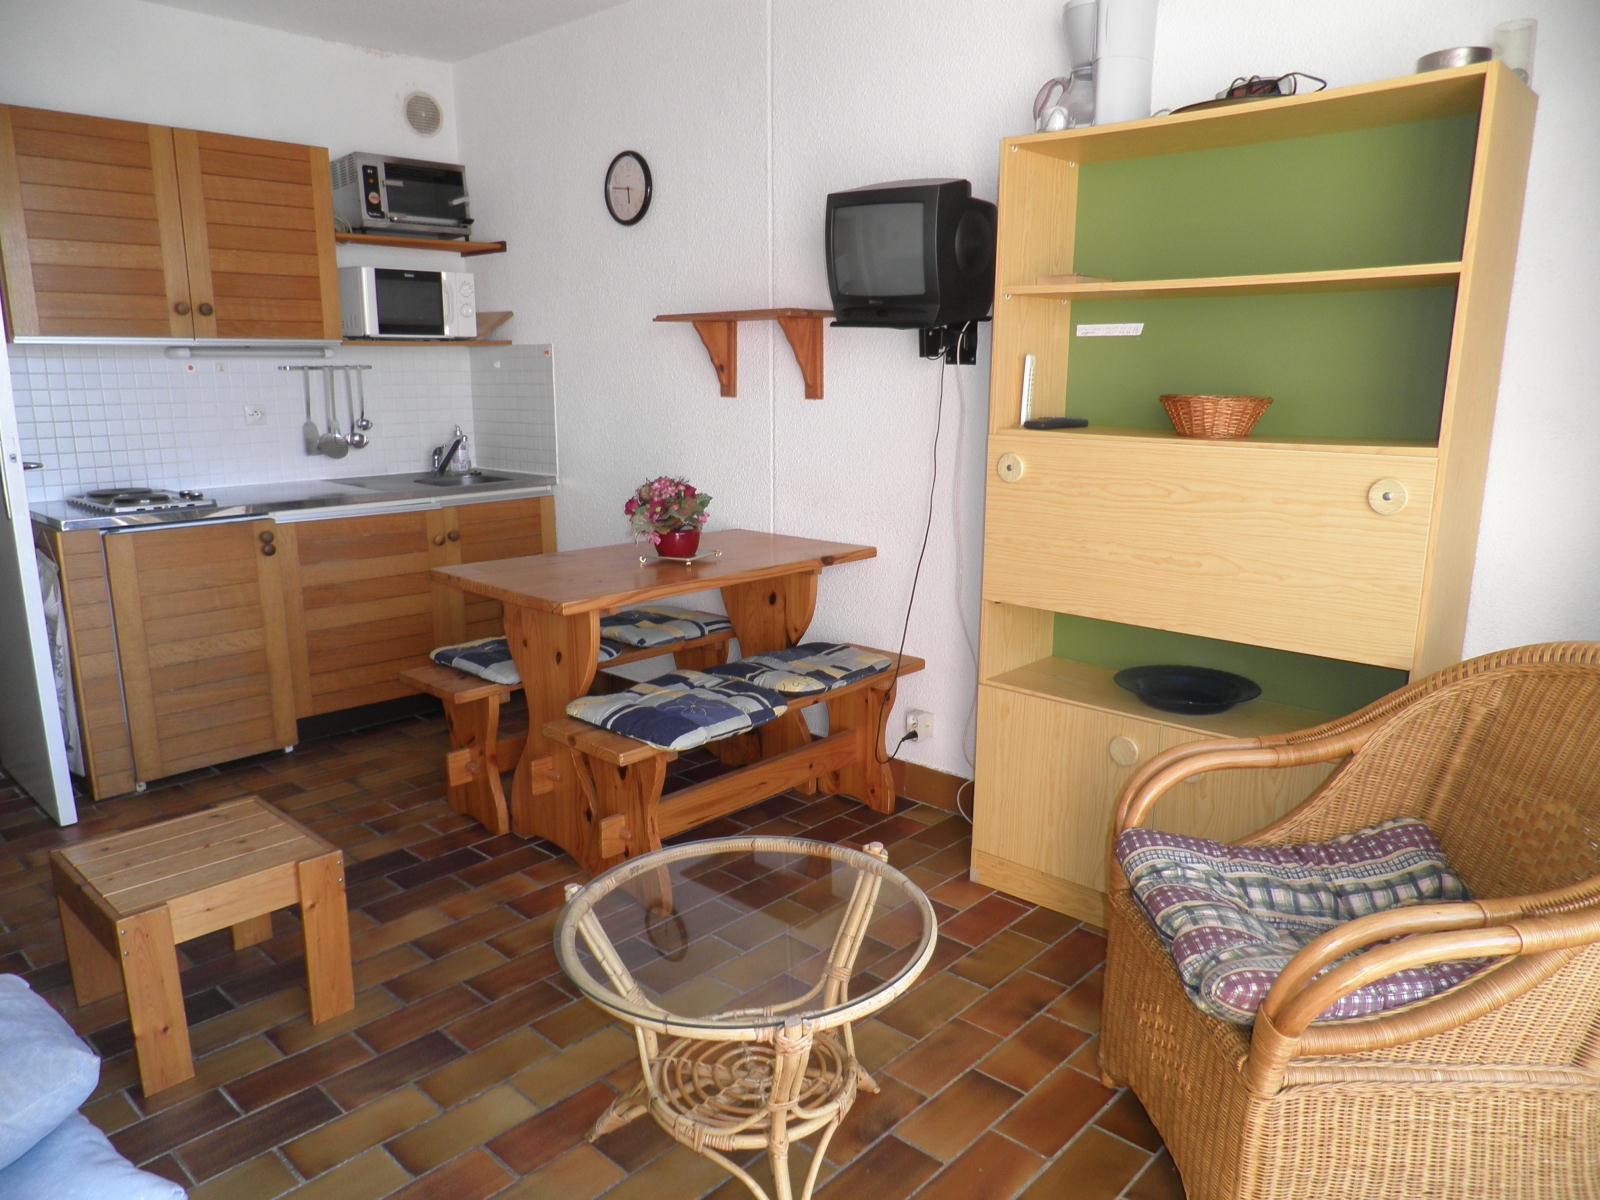 location les m ridiennes location vacances gruissan. Black Bedroom Furniture Sets. Home Design Ideas